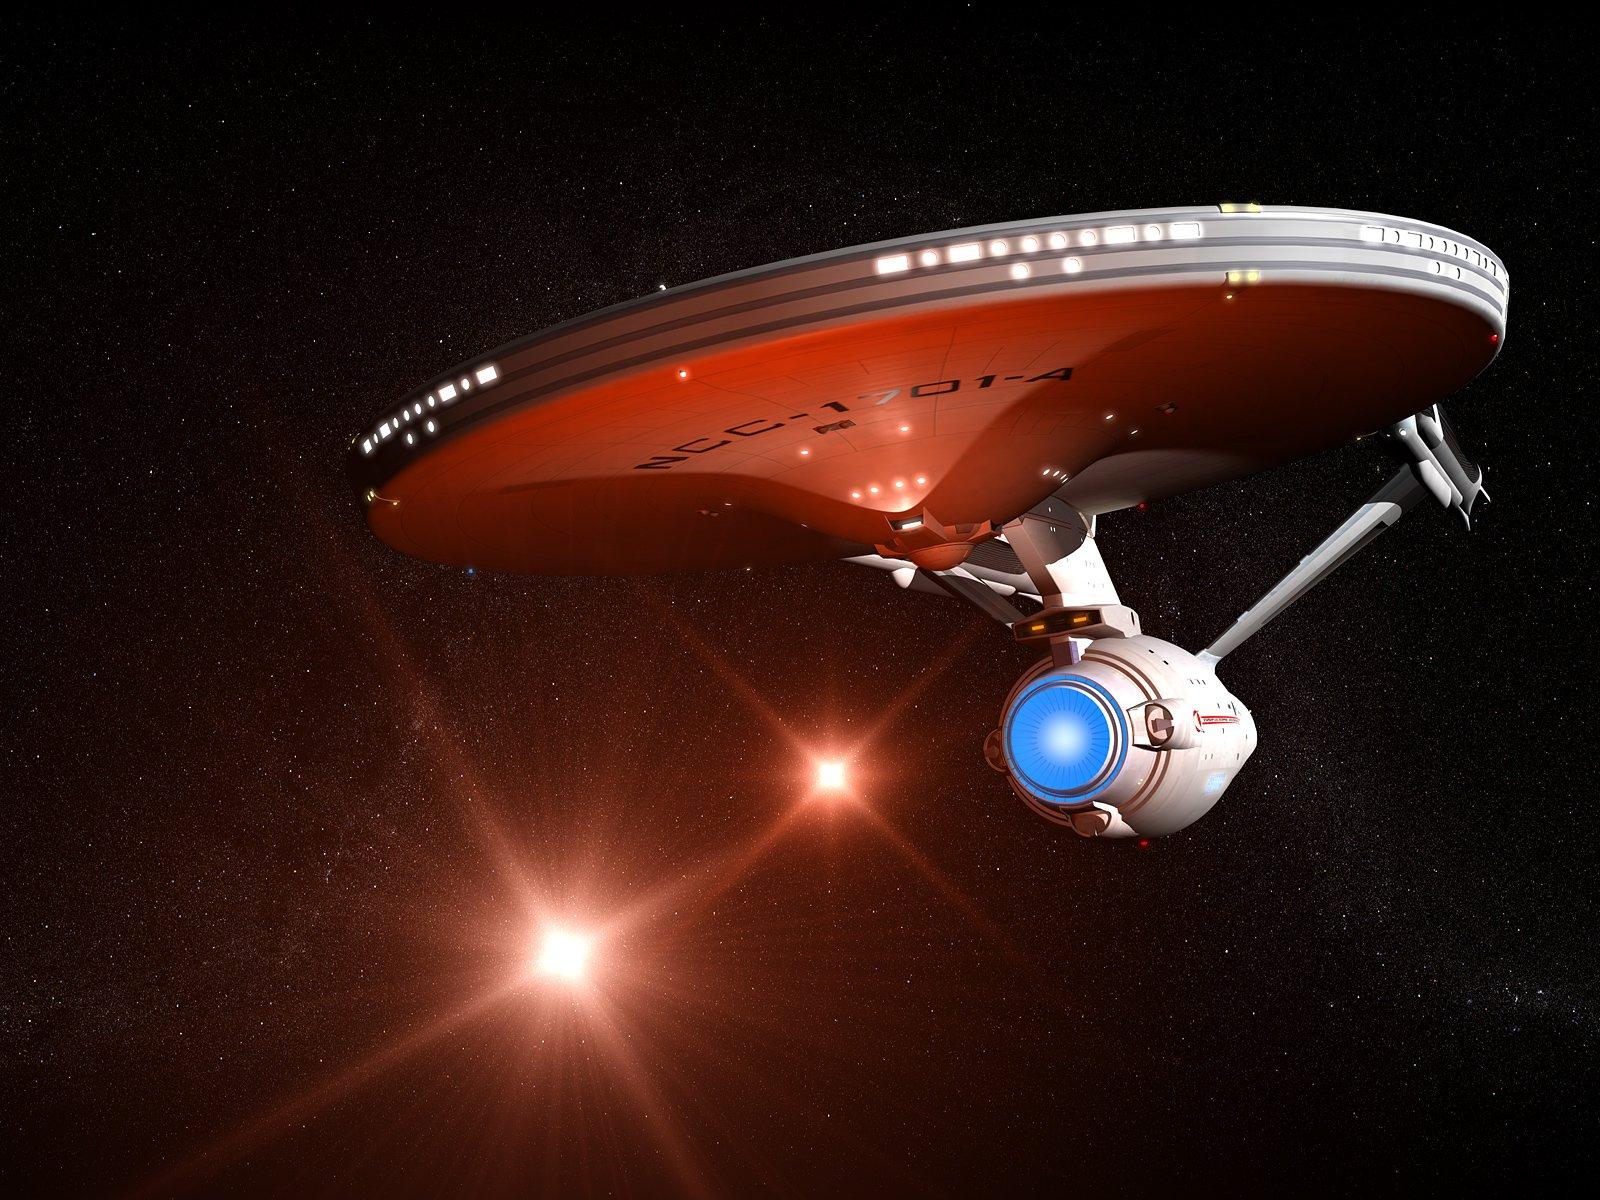 Star Trek website screen saver or desktop wallpaper Let us know 1600x1200